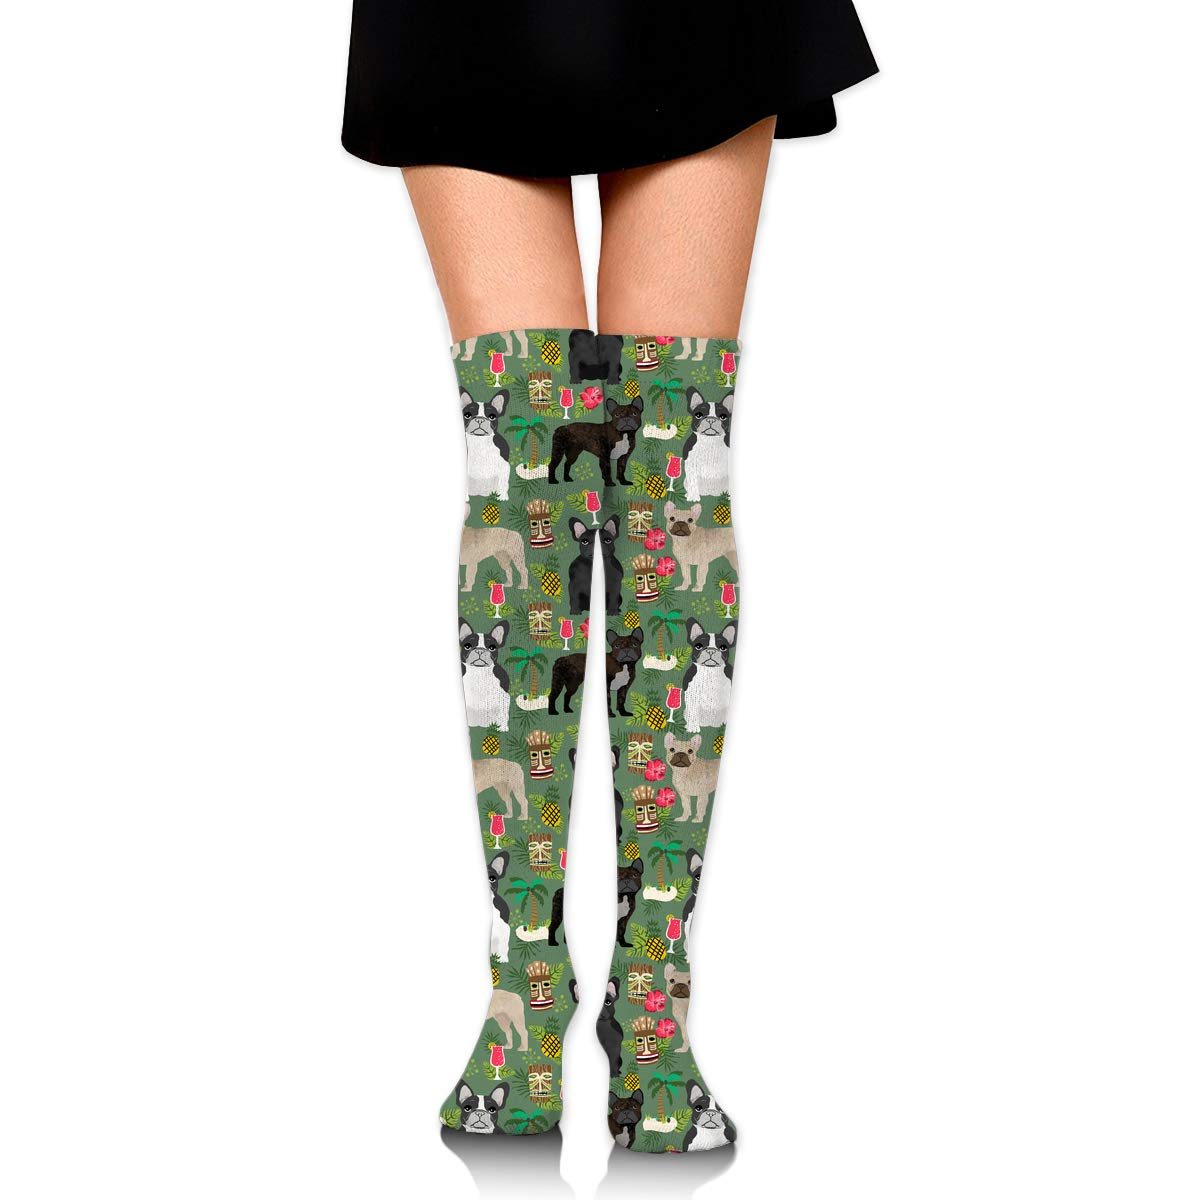 Womens//Girls French Bulldog Summer Islands Casual Socks Dresses Over The Knee High Socks 23.6